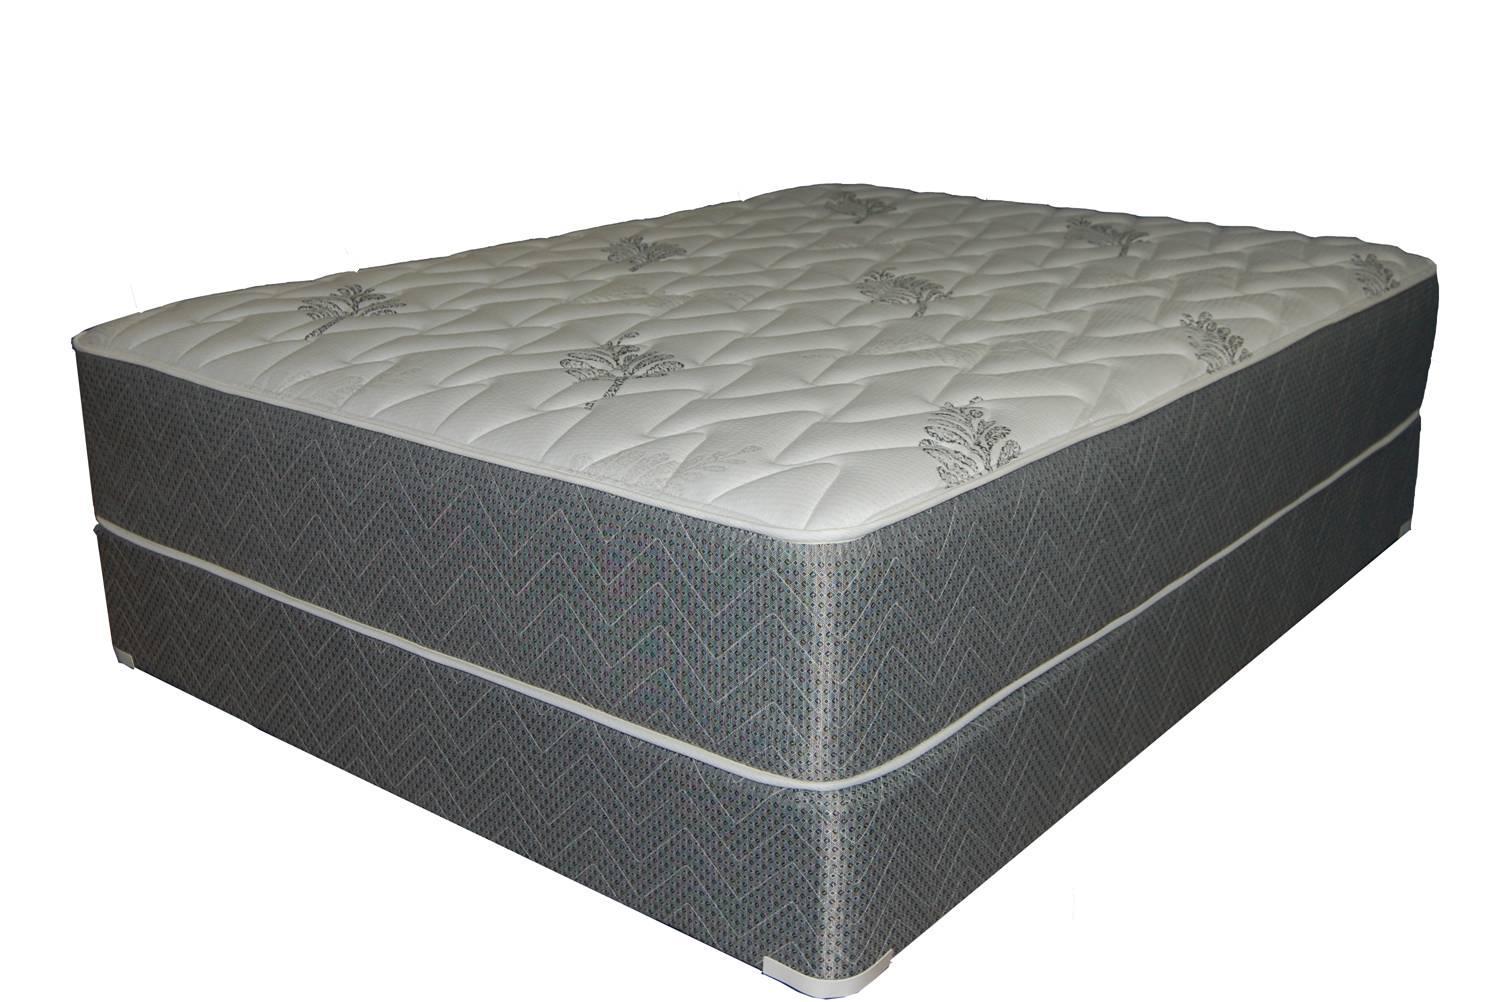 Mattress Firm Prices Cheap Prices Sales Wholesale Better Sleep Pocket Spring Mattress Firm